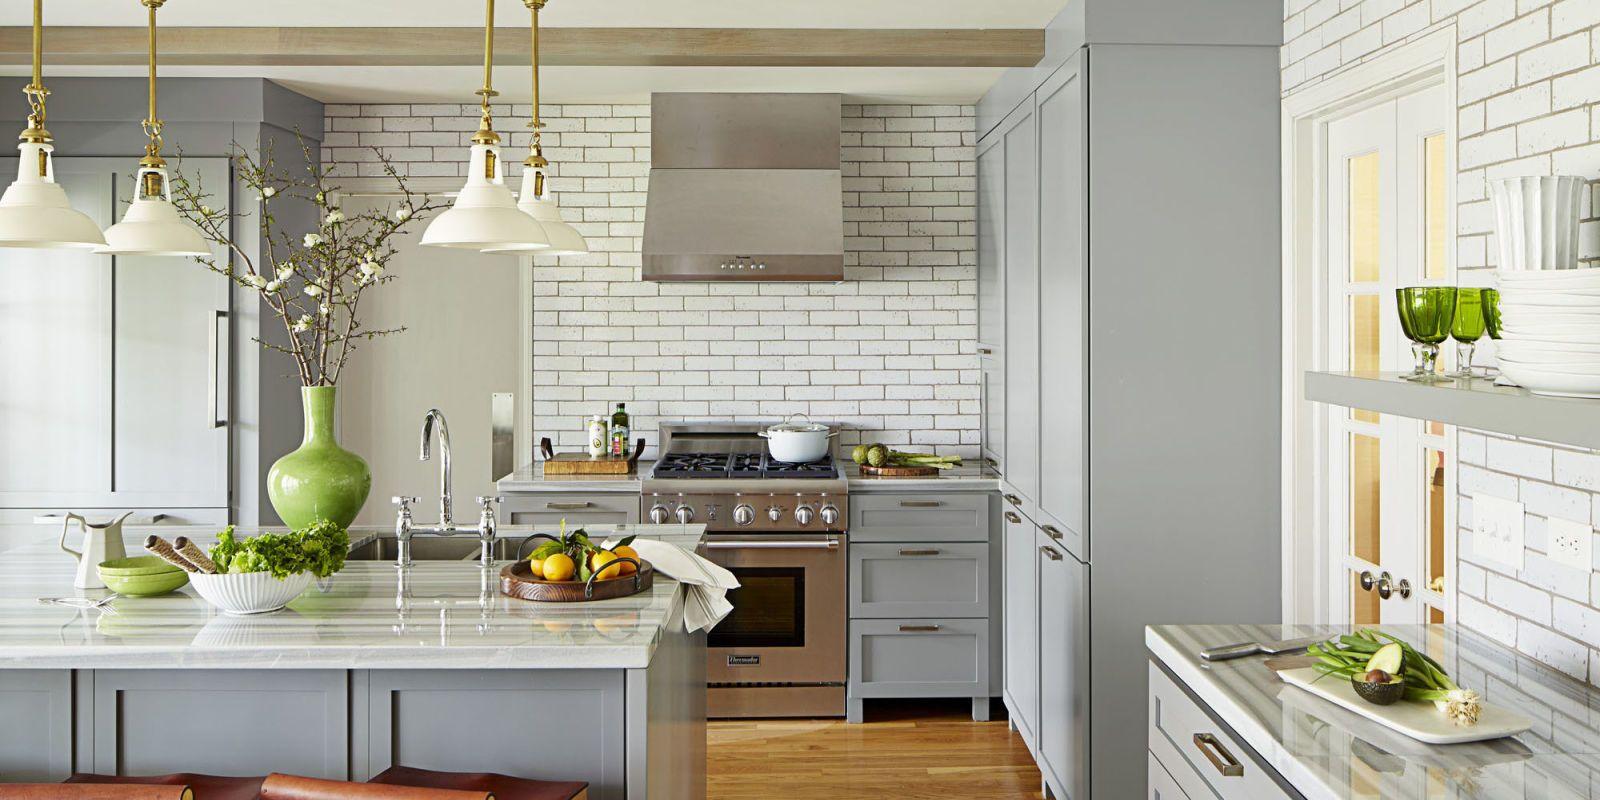 20+ Best Kitchen Countertops Design Ideas - Types of ... on Modern:egvna1Wjfco= Kitchen Counter Decor  id=23379